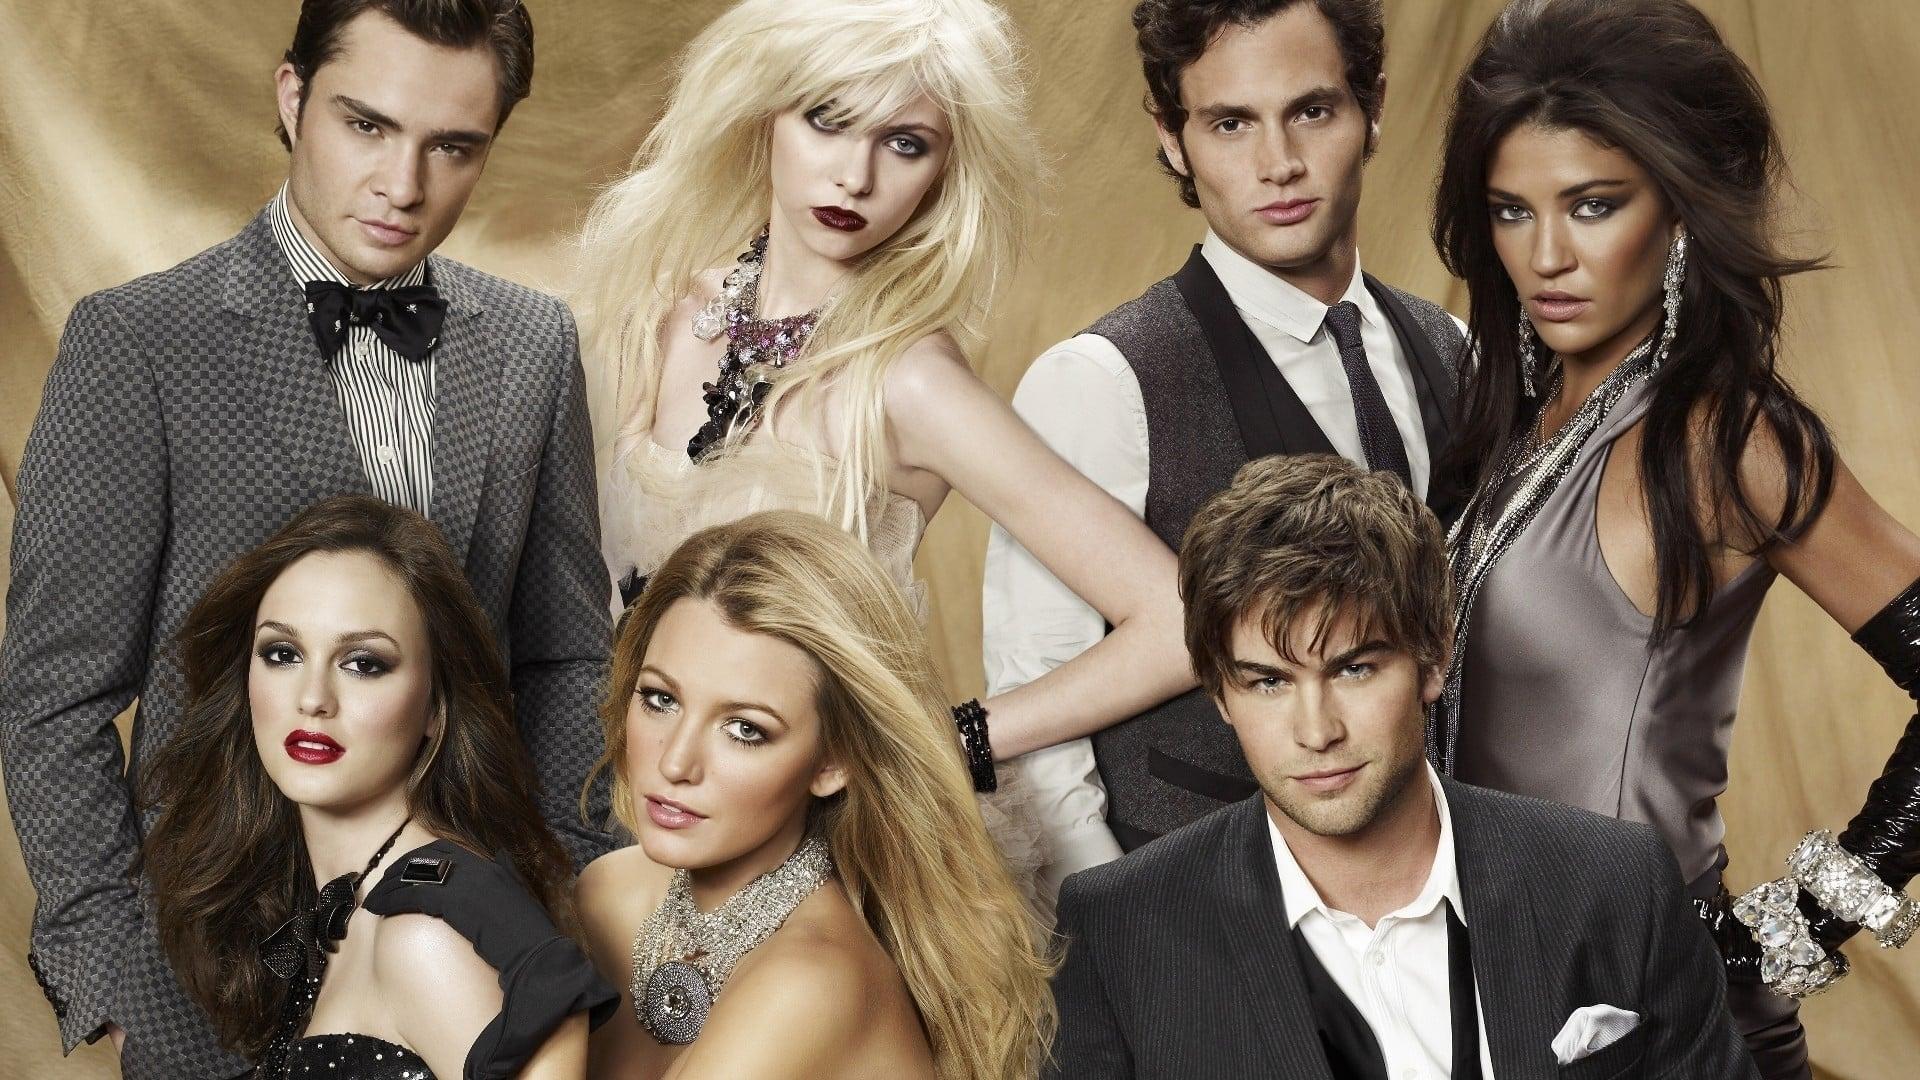 gossip girl saison 2 episode 8 casting